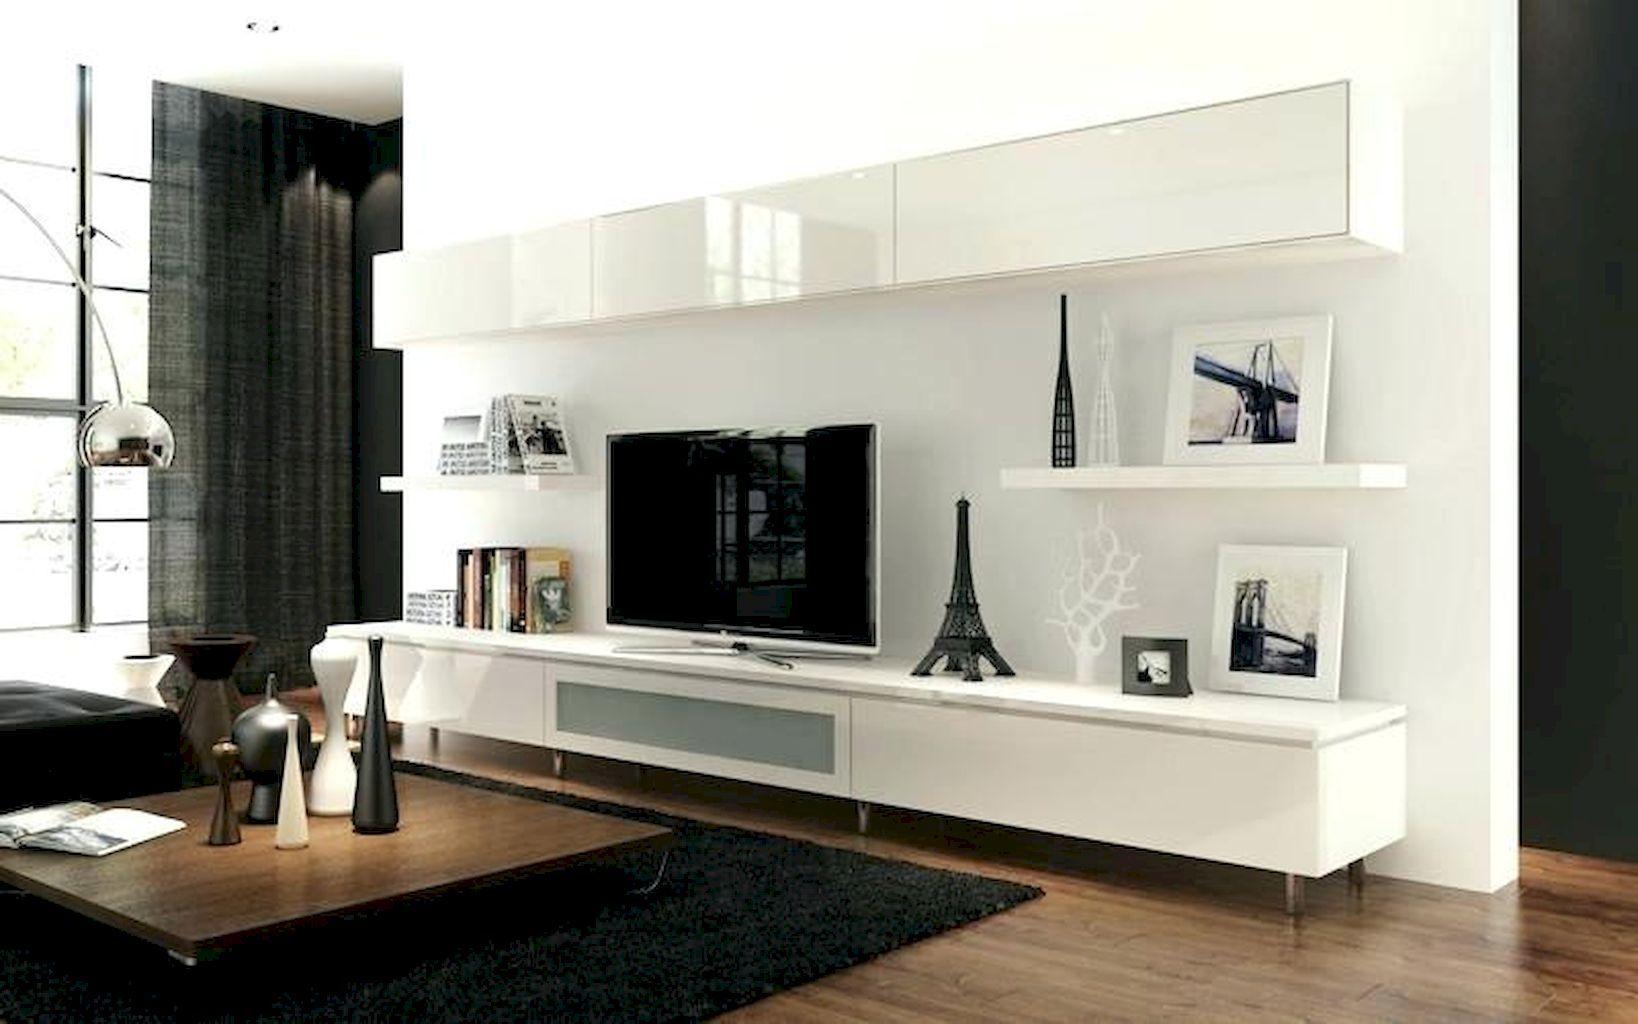 55 Brilliant Floating Shelves Design For Living Room Ideas Decorationroom Living Room Tv Floating Cabinets Wall Mounted Tv Cabinet